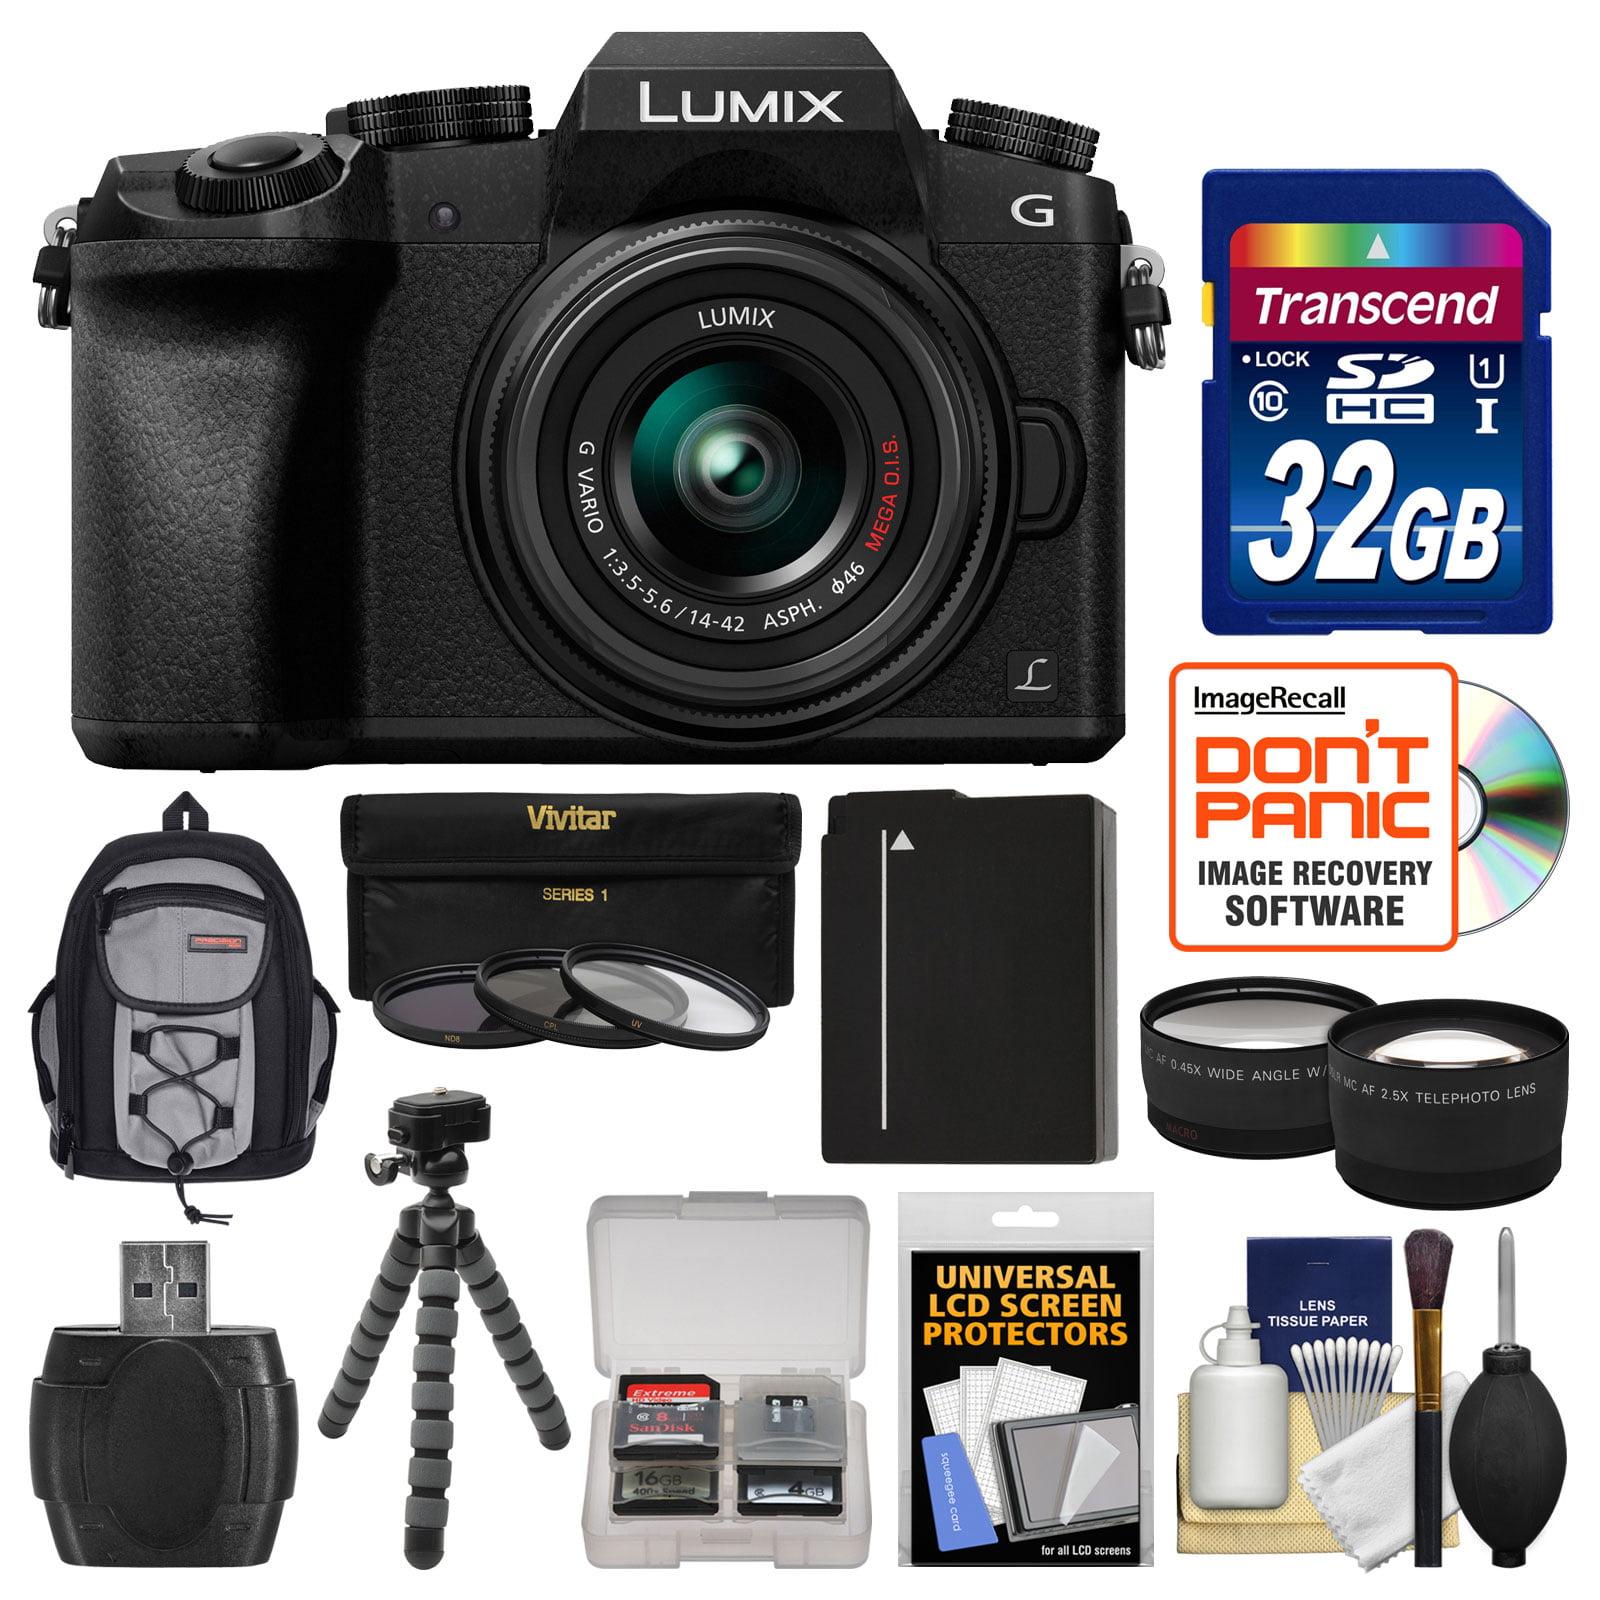 Panasonic Lumix DMC-G7 4K Wi-Fi Digital Camera & 14-42mm Lens (Black) with 32GB Card + Backpack + Battery + Flex Tripod + Filters + Tele/Wide Lens Kit